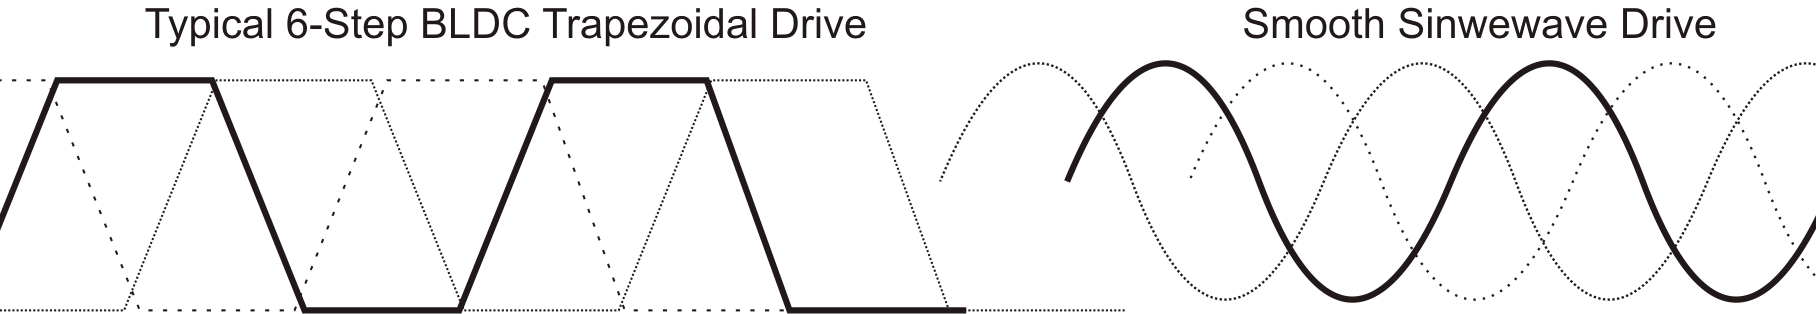 Trapezoidal vs Sinusoidal BLDC Motor Controller Drive